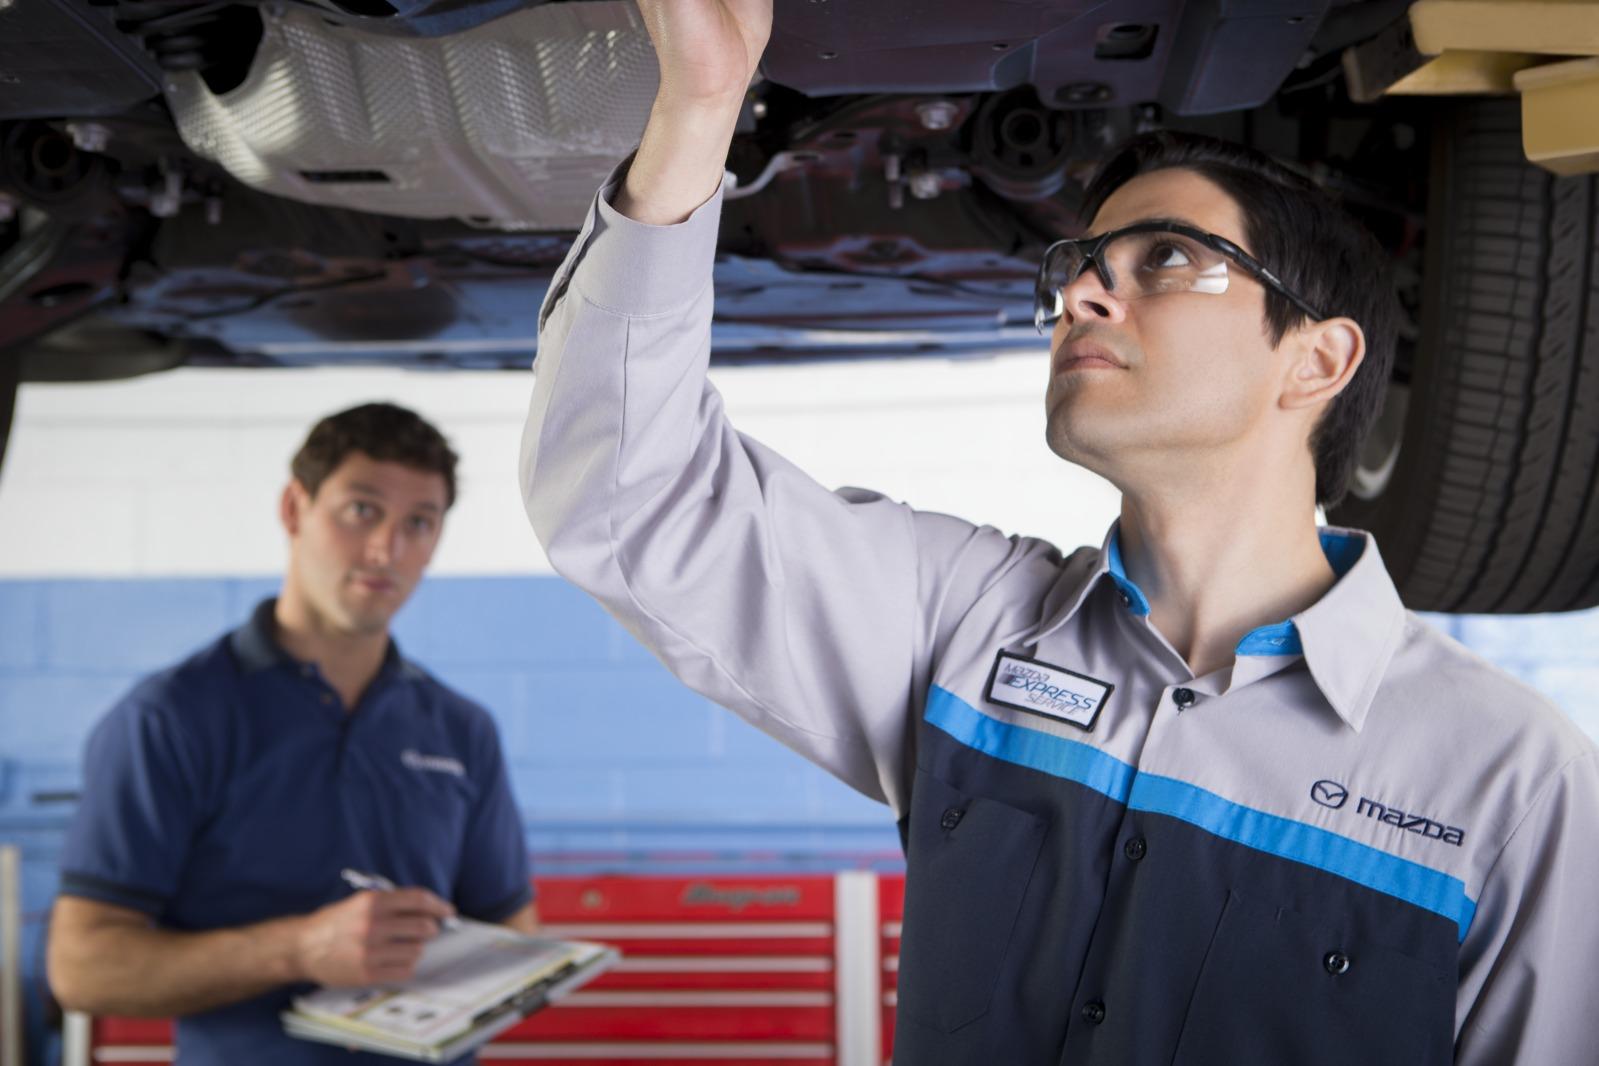 Kelebihan Mazda Servis Harga